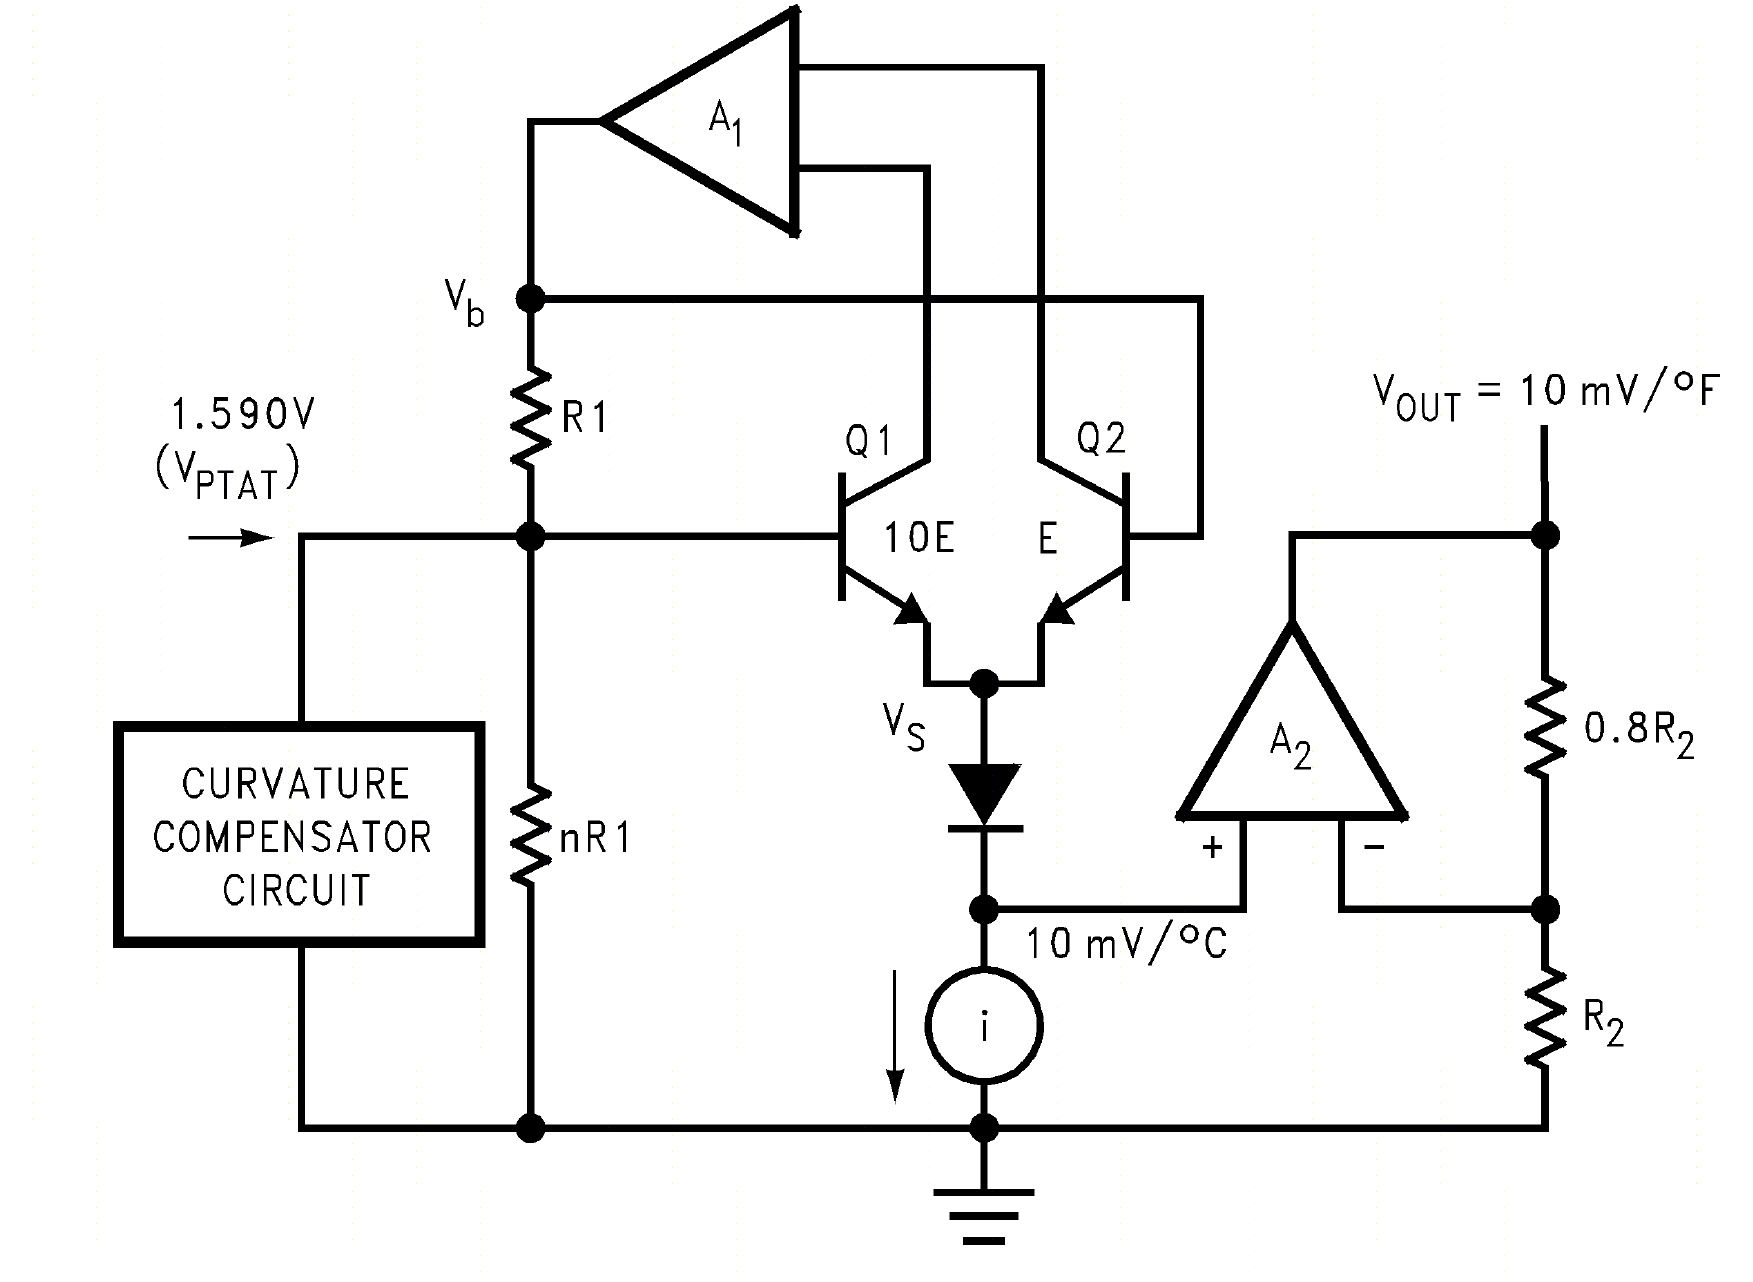 explanation regarding this circuit i wish to understand the schematic [ 1753 x 1282 Pixel ]